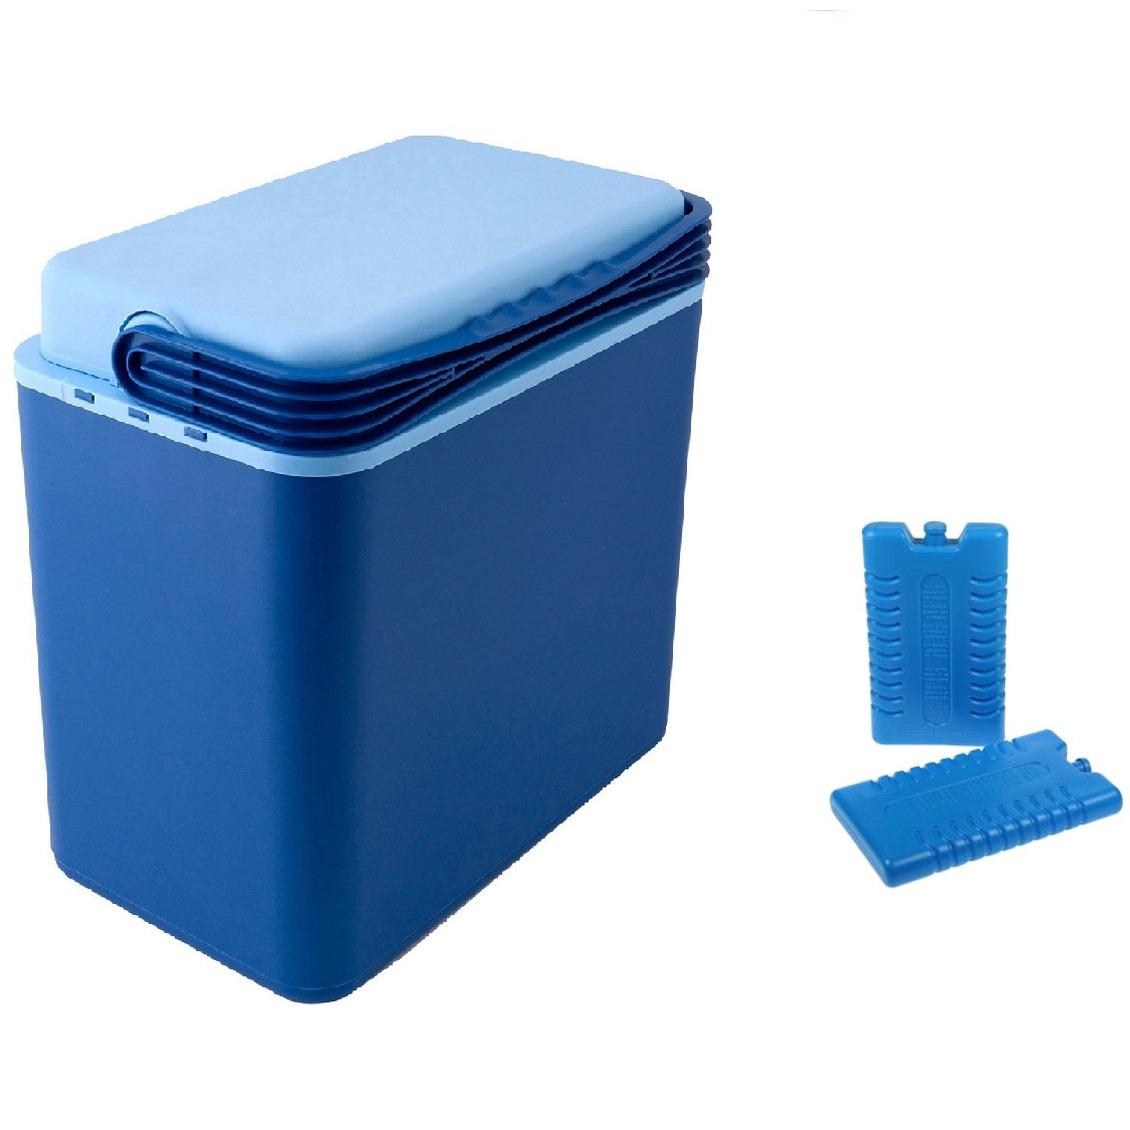 Koelbox donkerblauw 24 liter 39 x 25 x 40 cm incl. 2 koelelementen